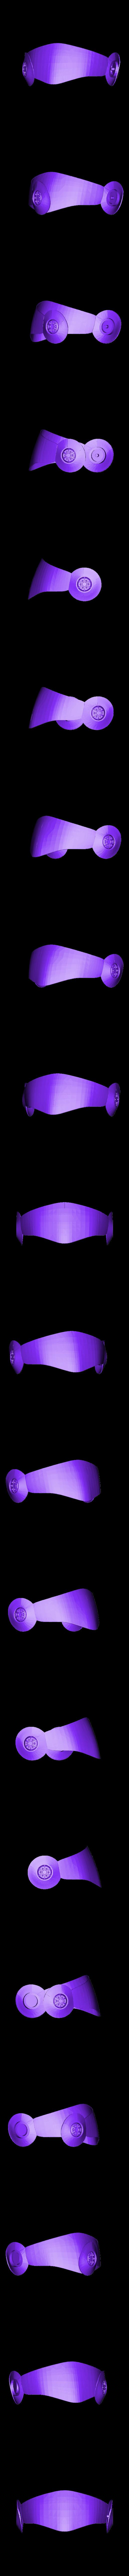 helmet4.stl Download free STL file helmet model with contest • 3D printer object, AlbertKhan3D